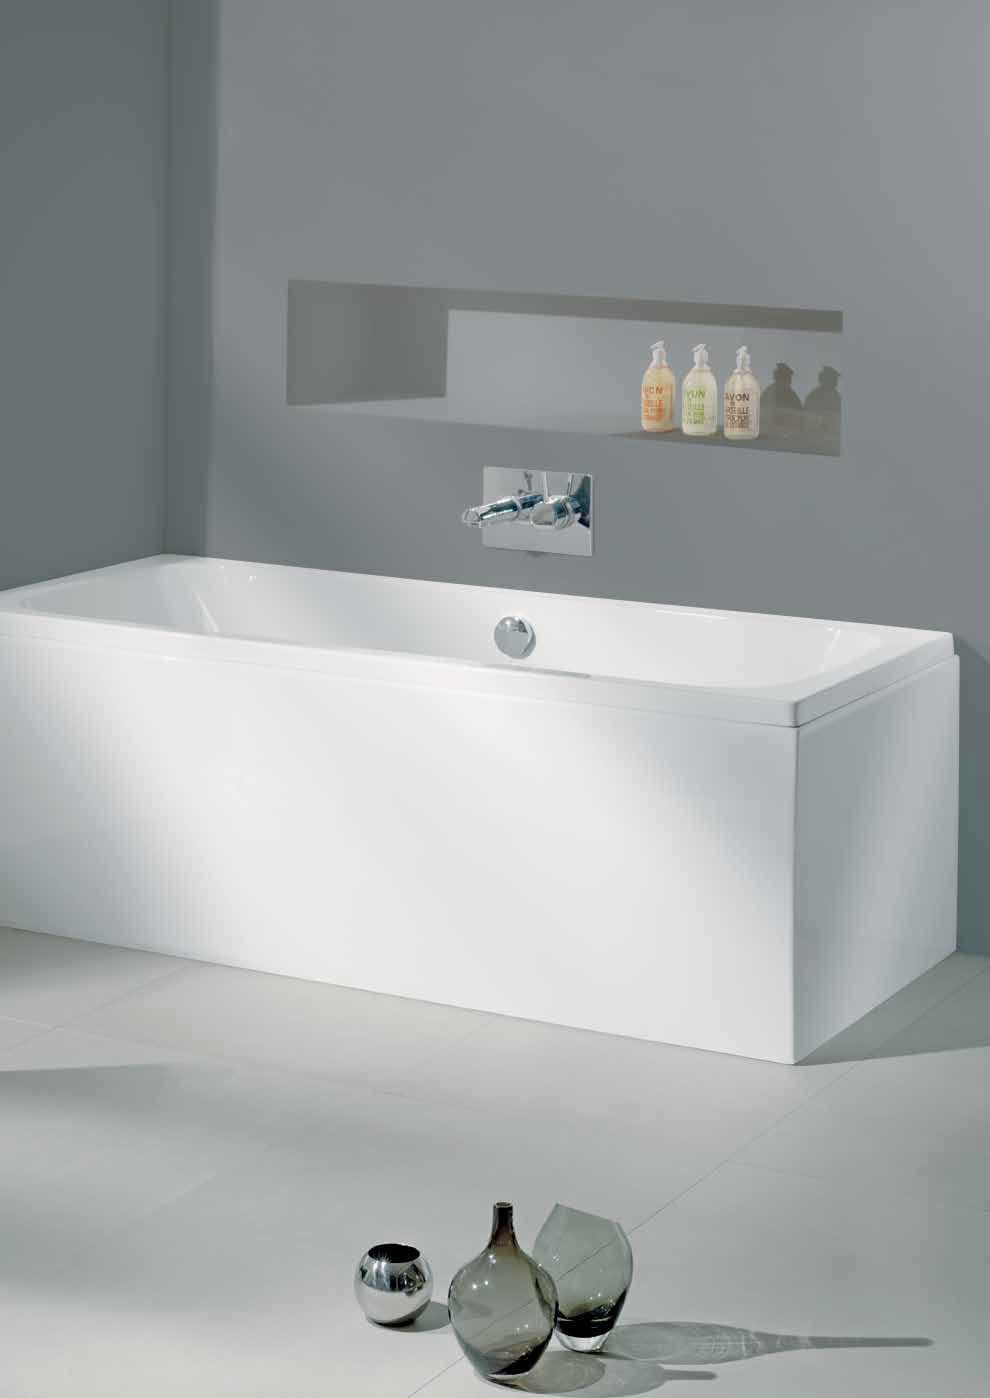 Adamsez - Original Tile & Bath